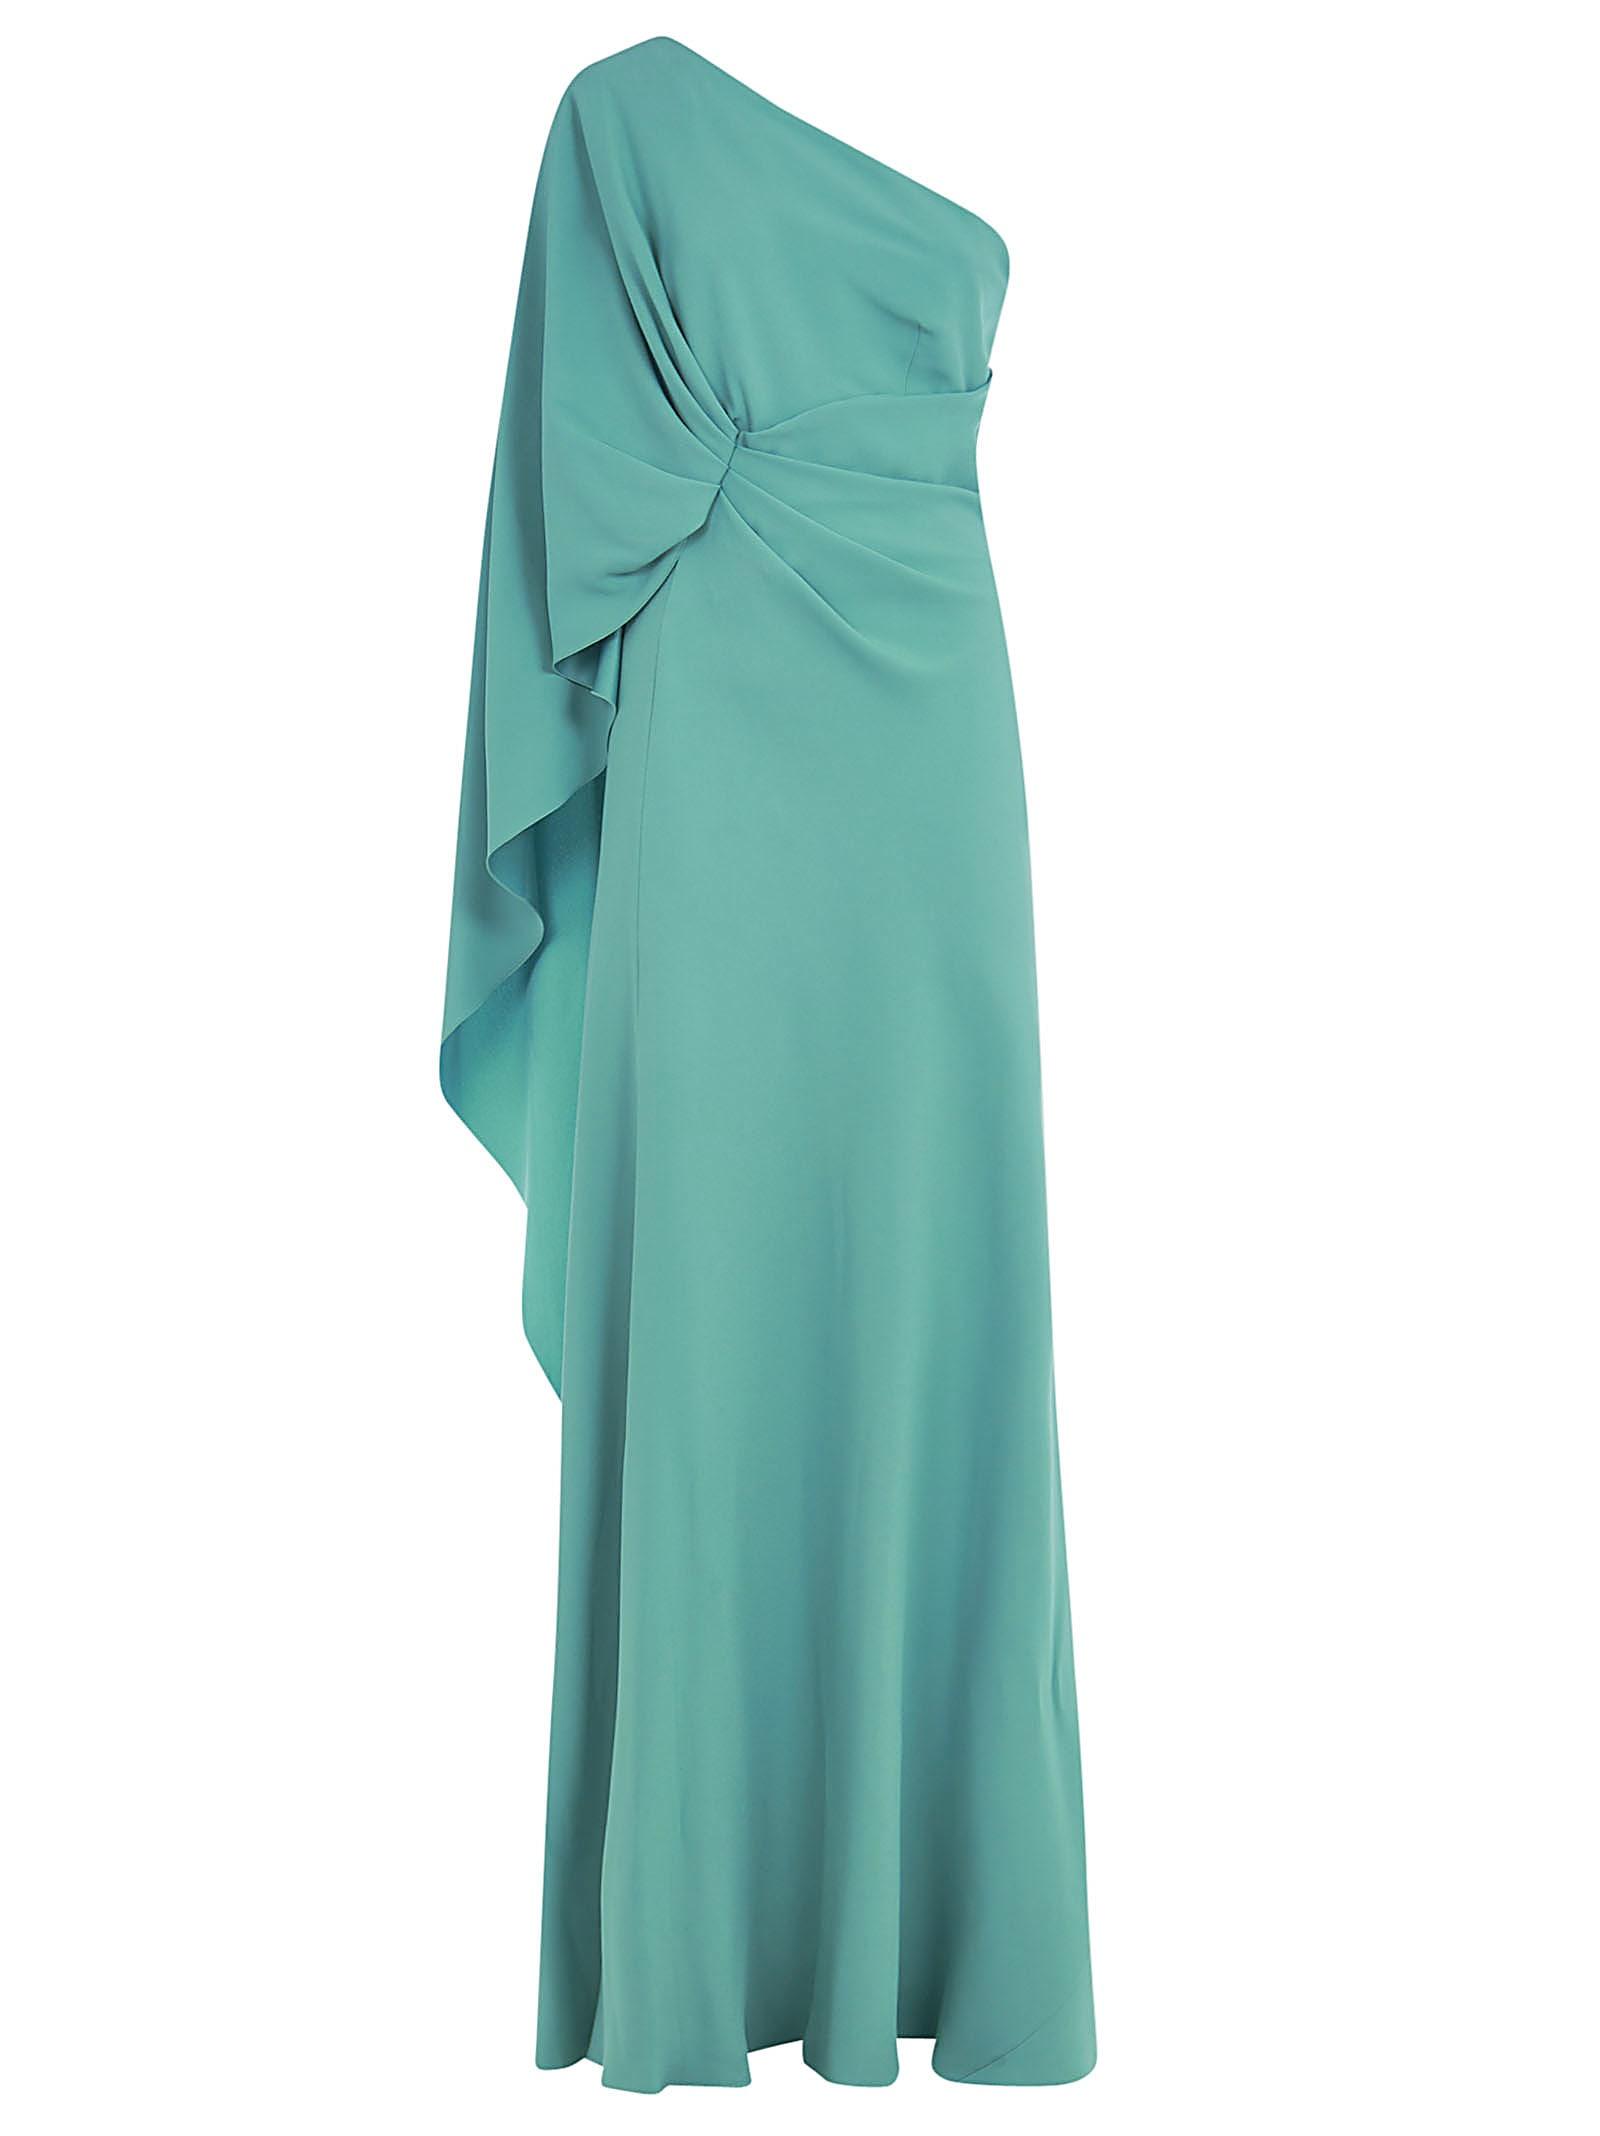 Buy Alberta Ferretti One-sleeve Maxi Dress online, shop Alberta Ferretti with free shipping